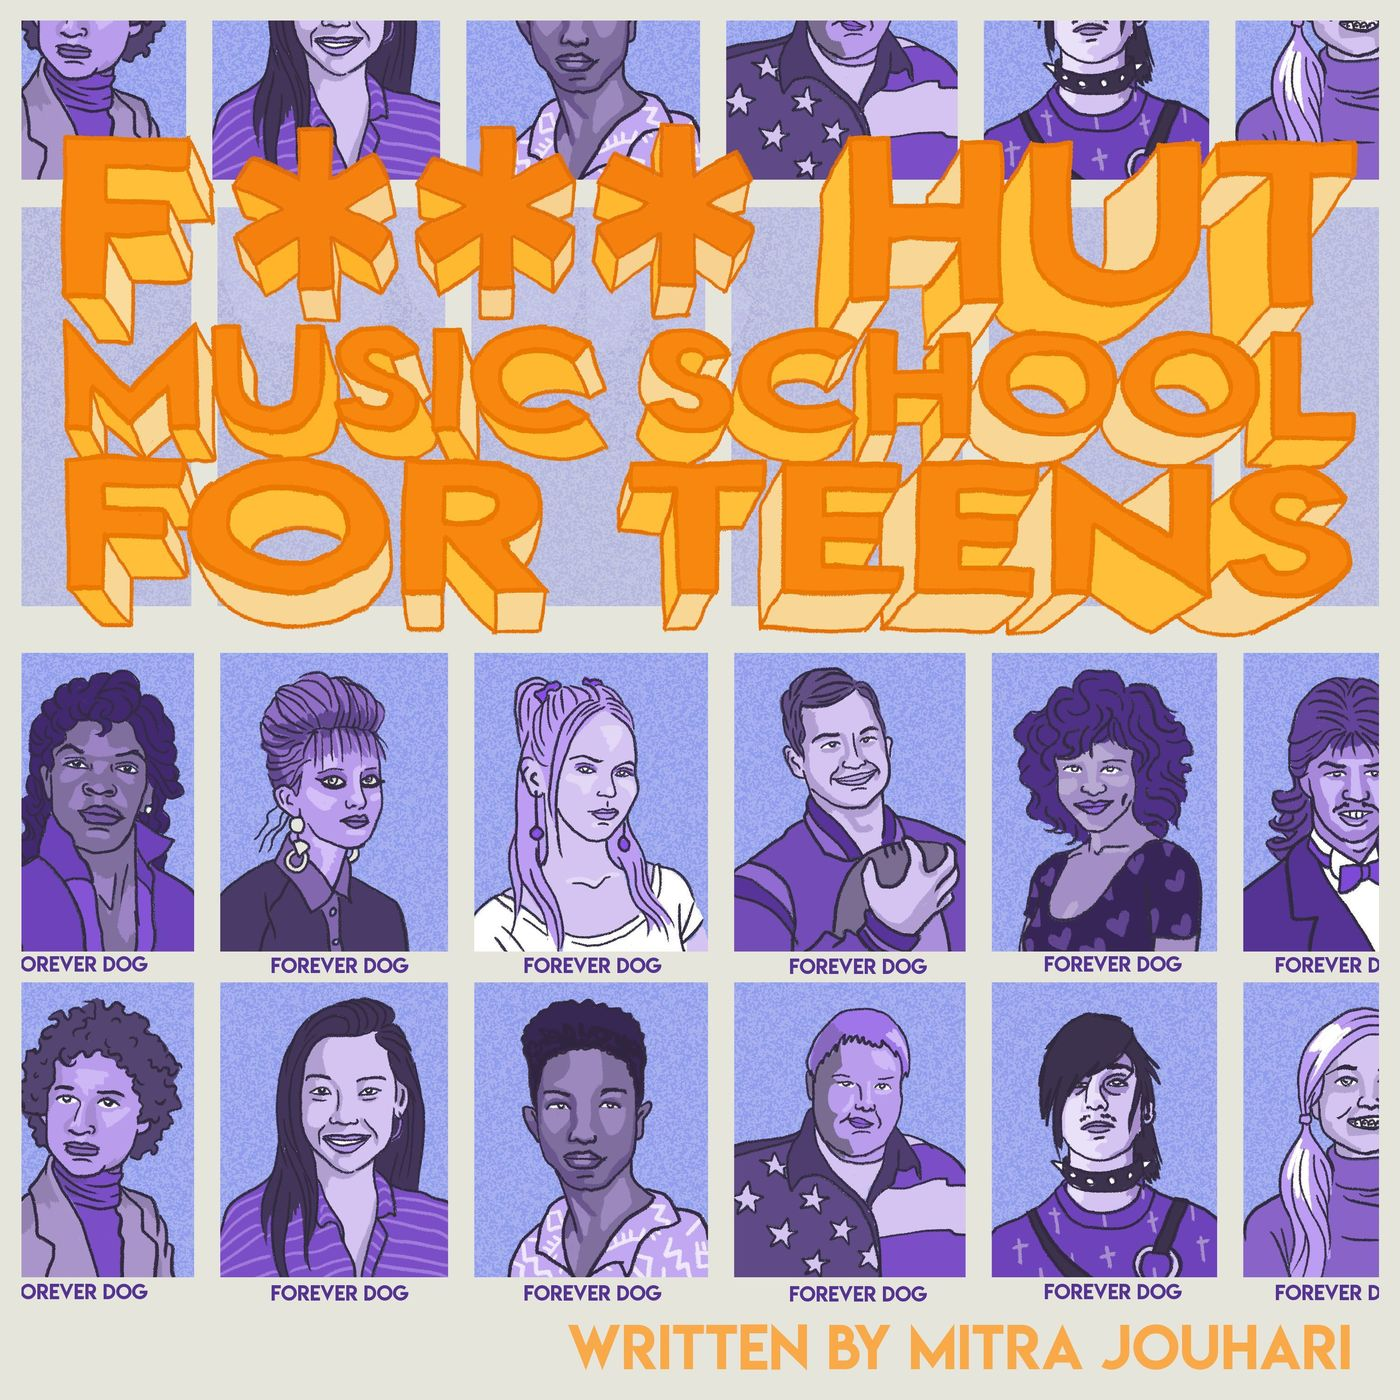 F*** Hut Music School for Teens